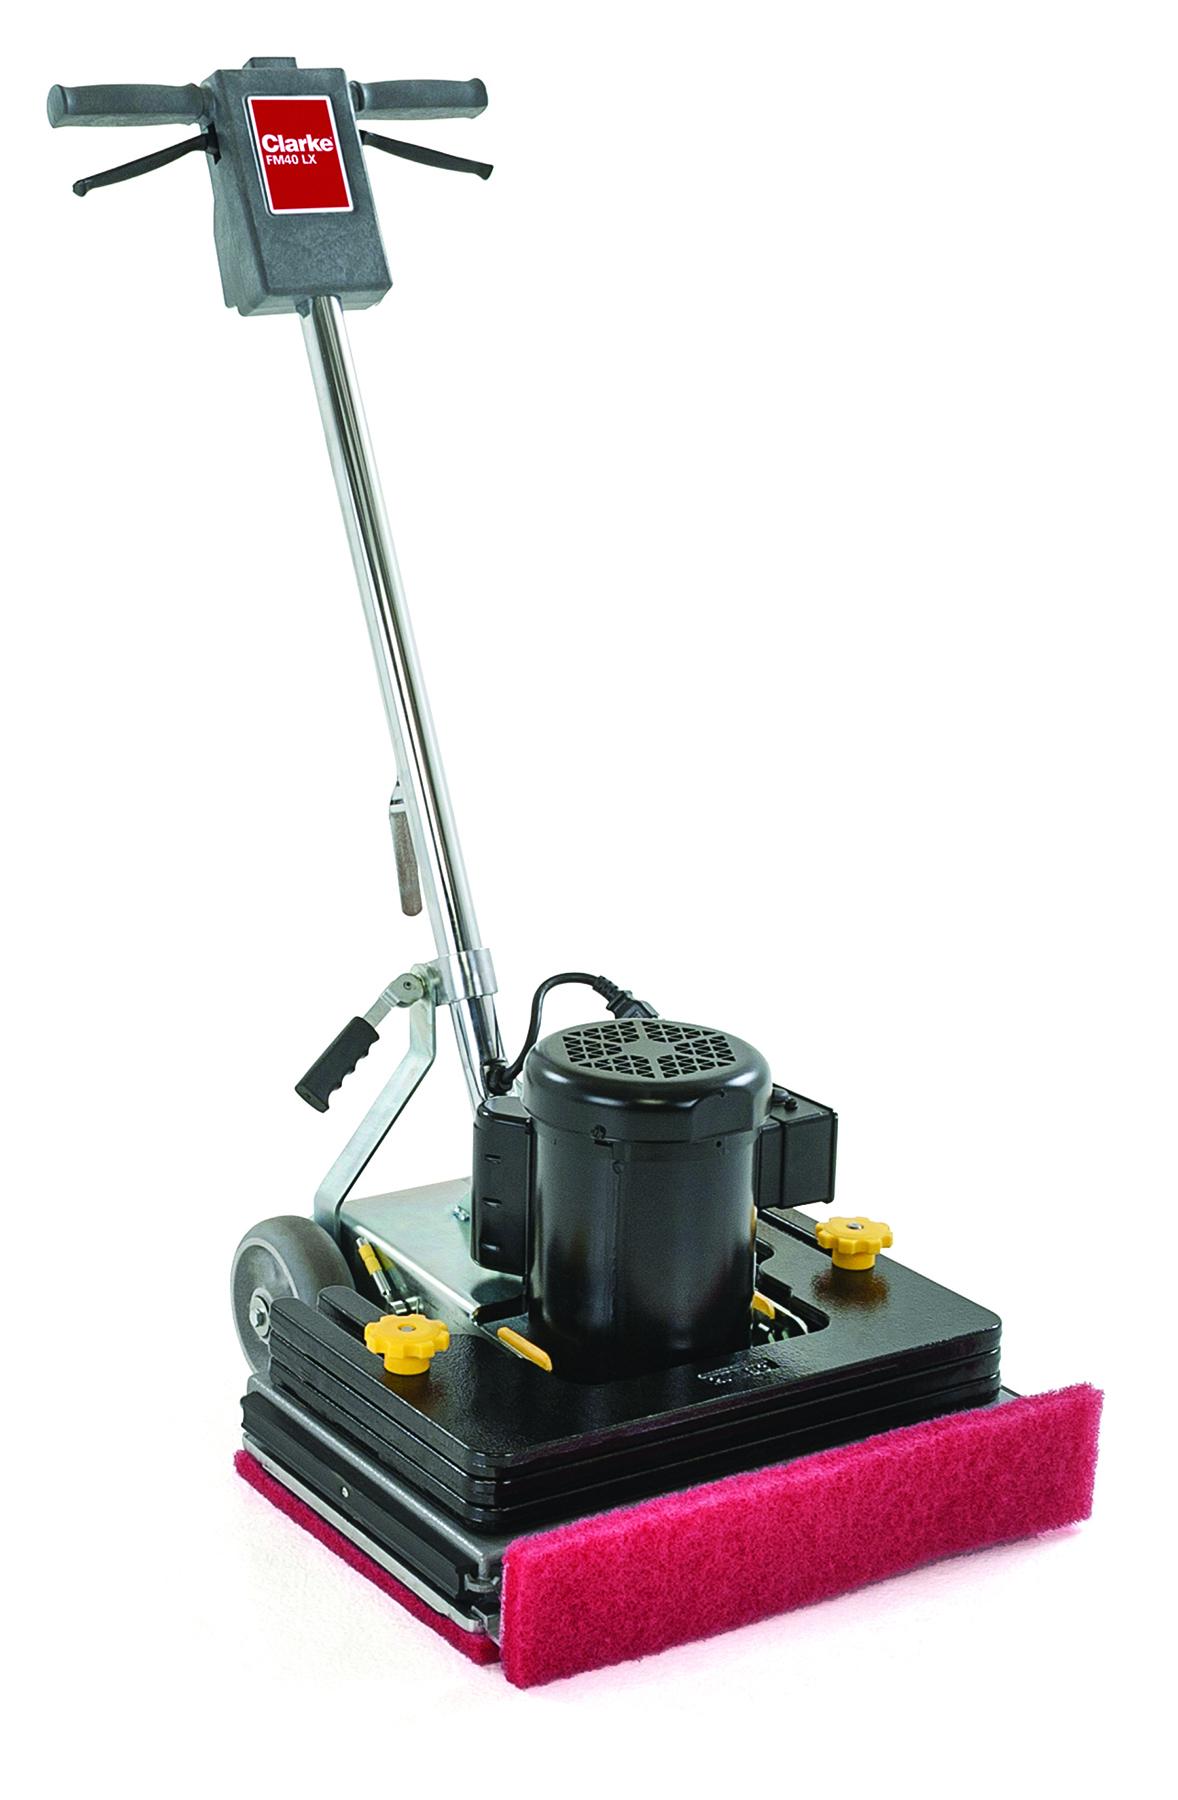 FM40 LX orbital scrubbing floor machine, fm40 st clarke machine